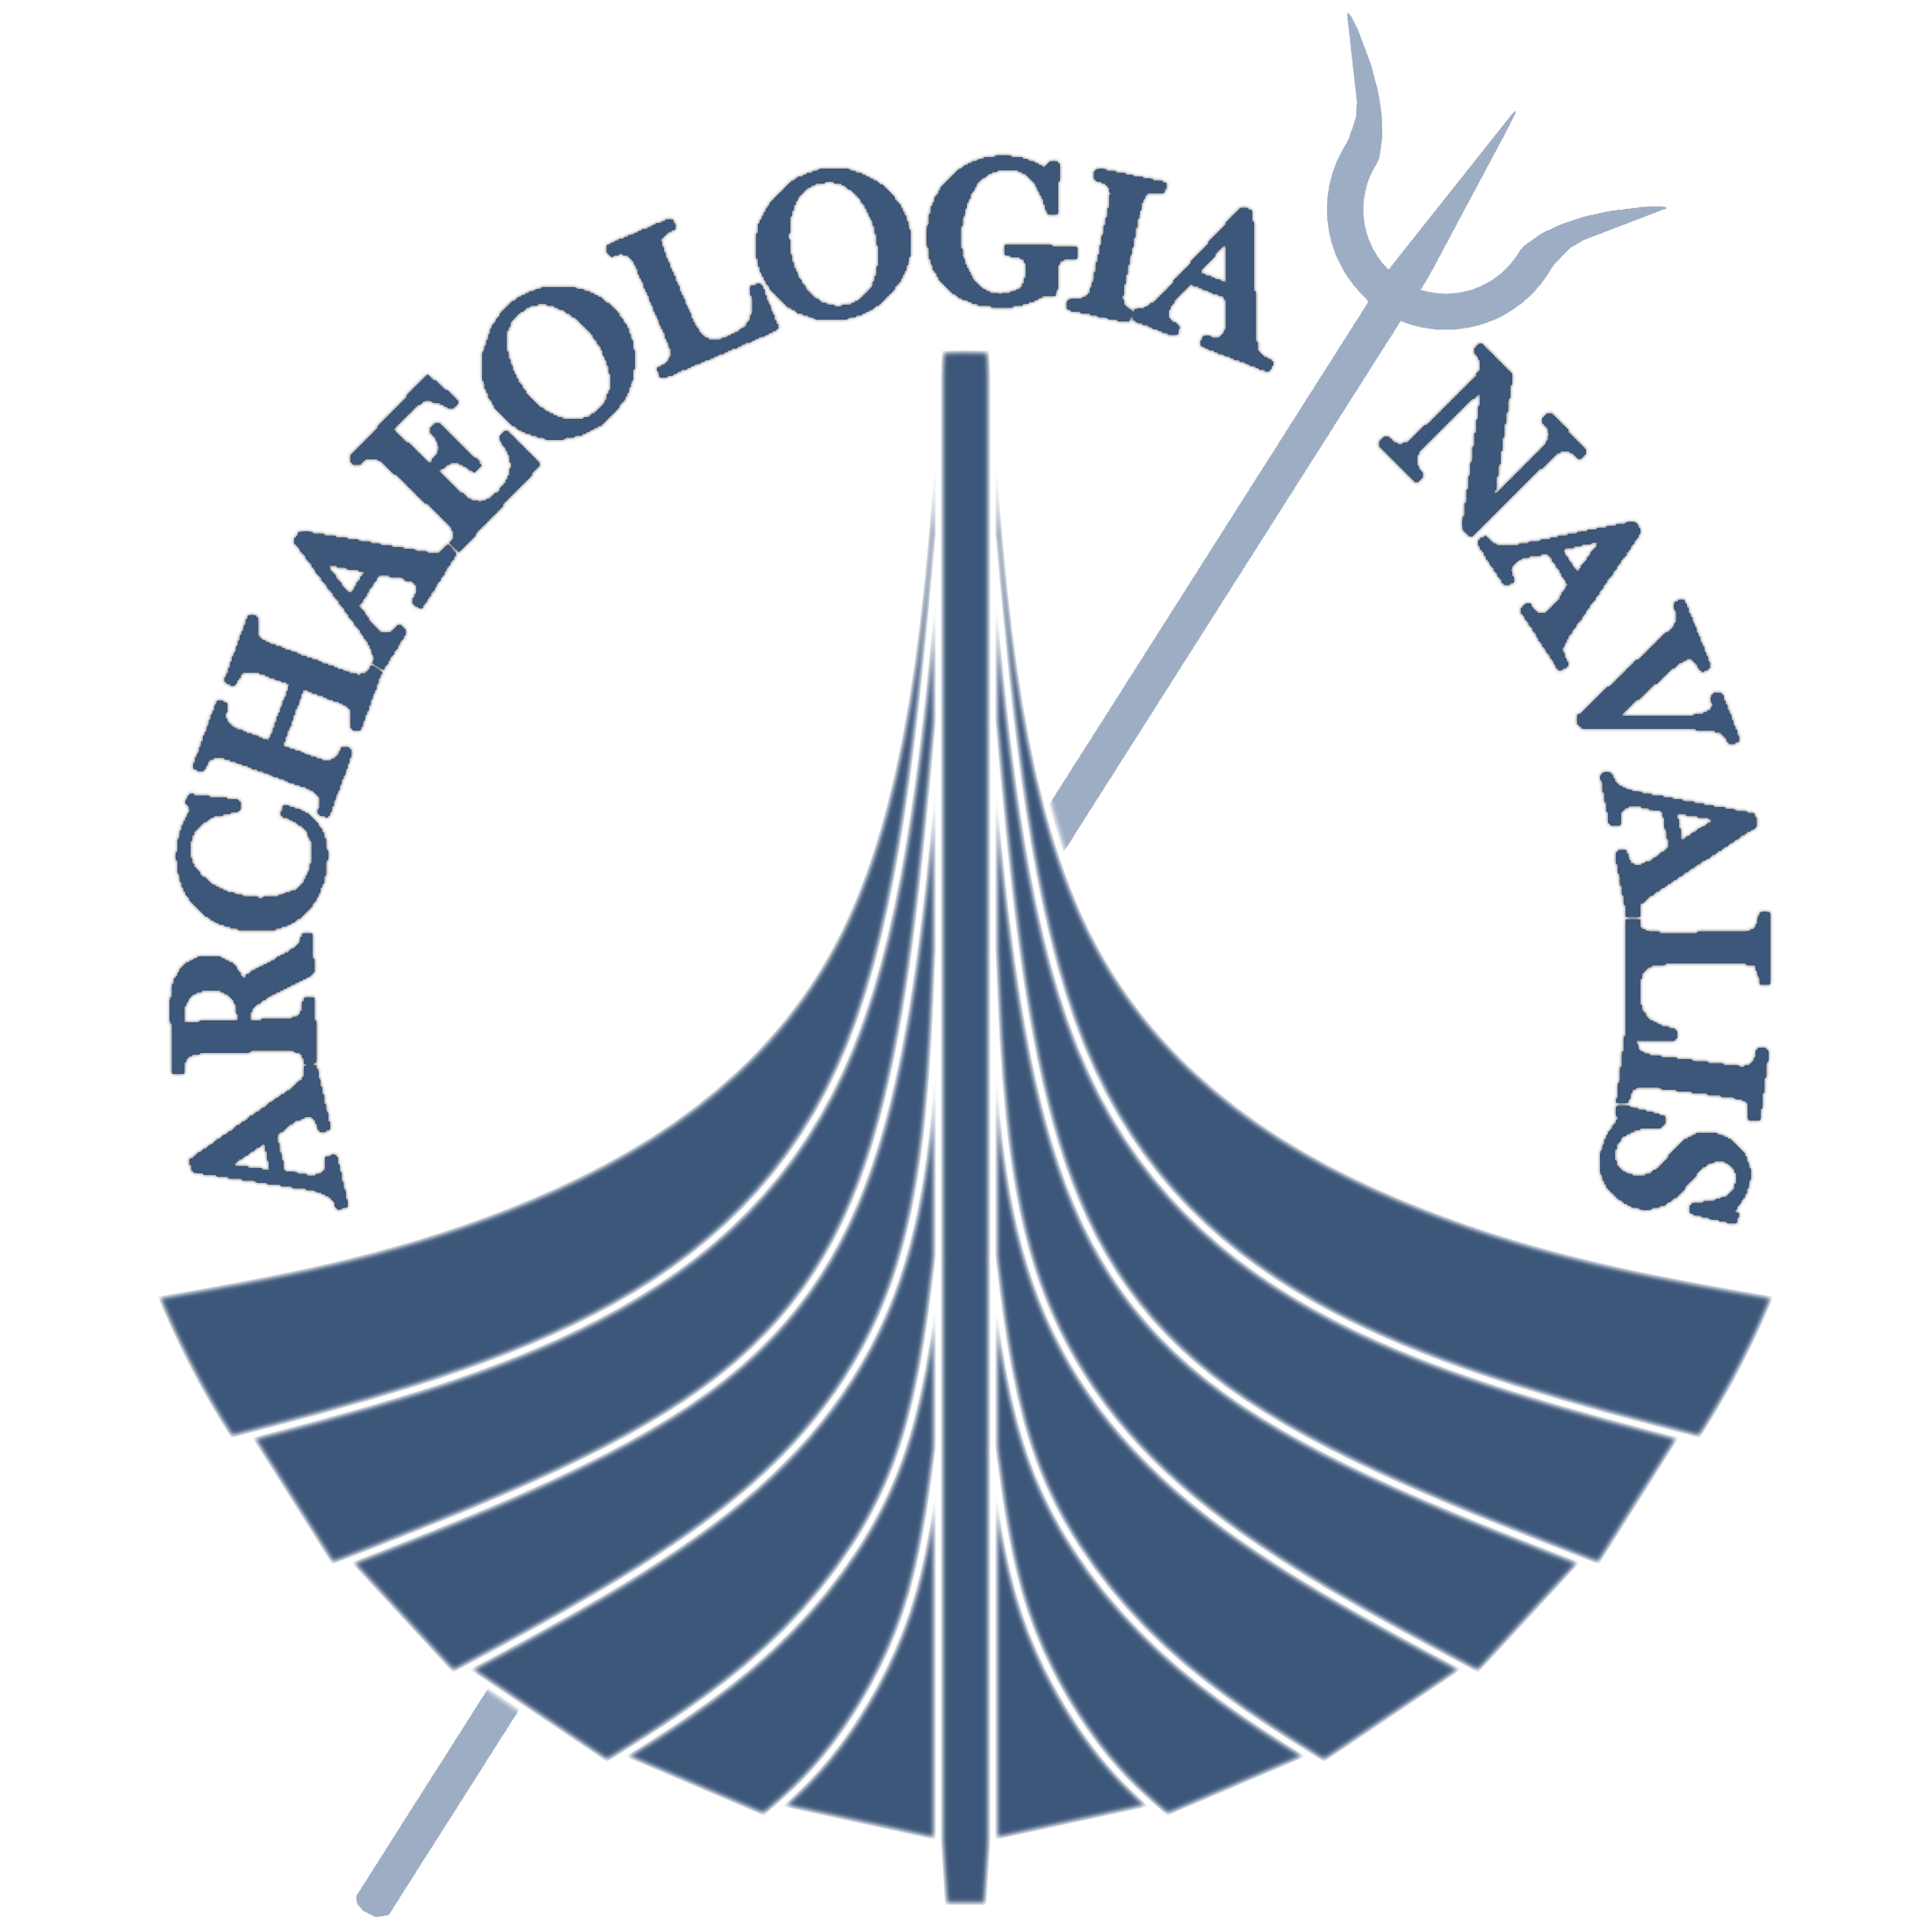 Archaeologia Navalis